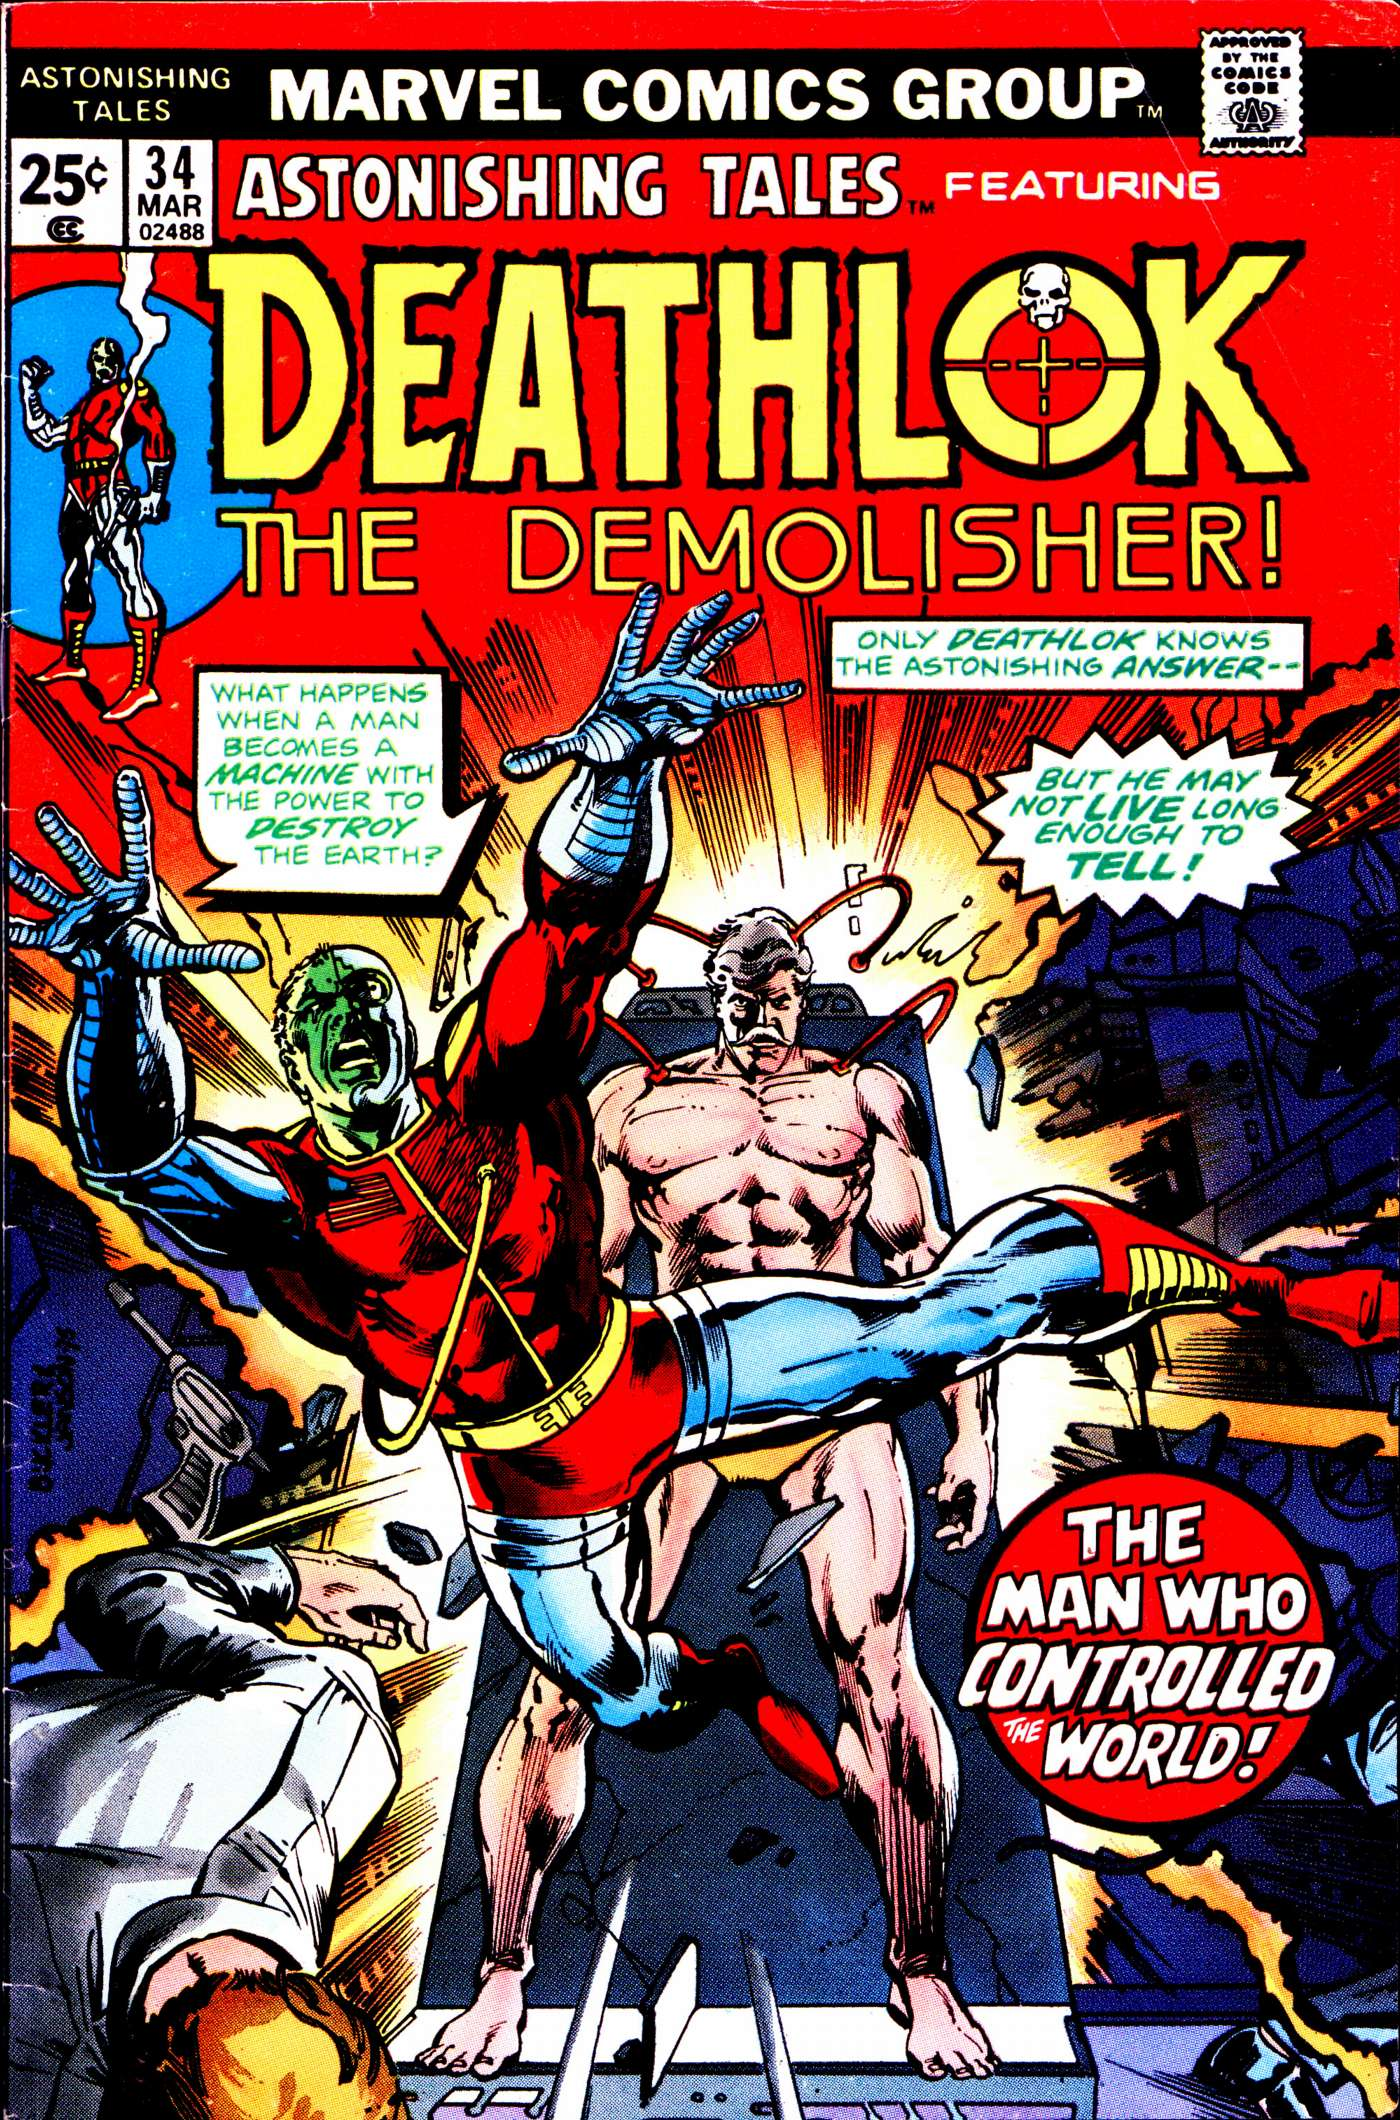 Read online Astonishing Tales (1970) comic -  Issue #34 - 1